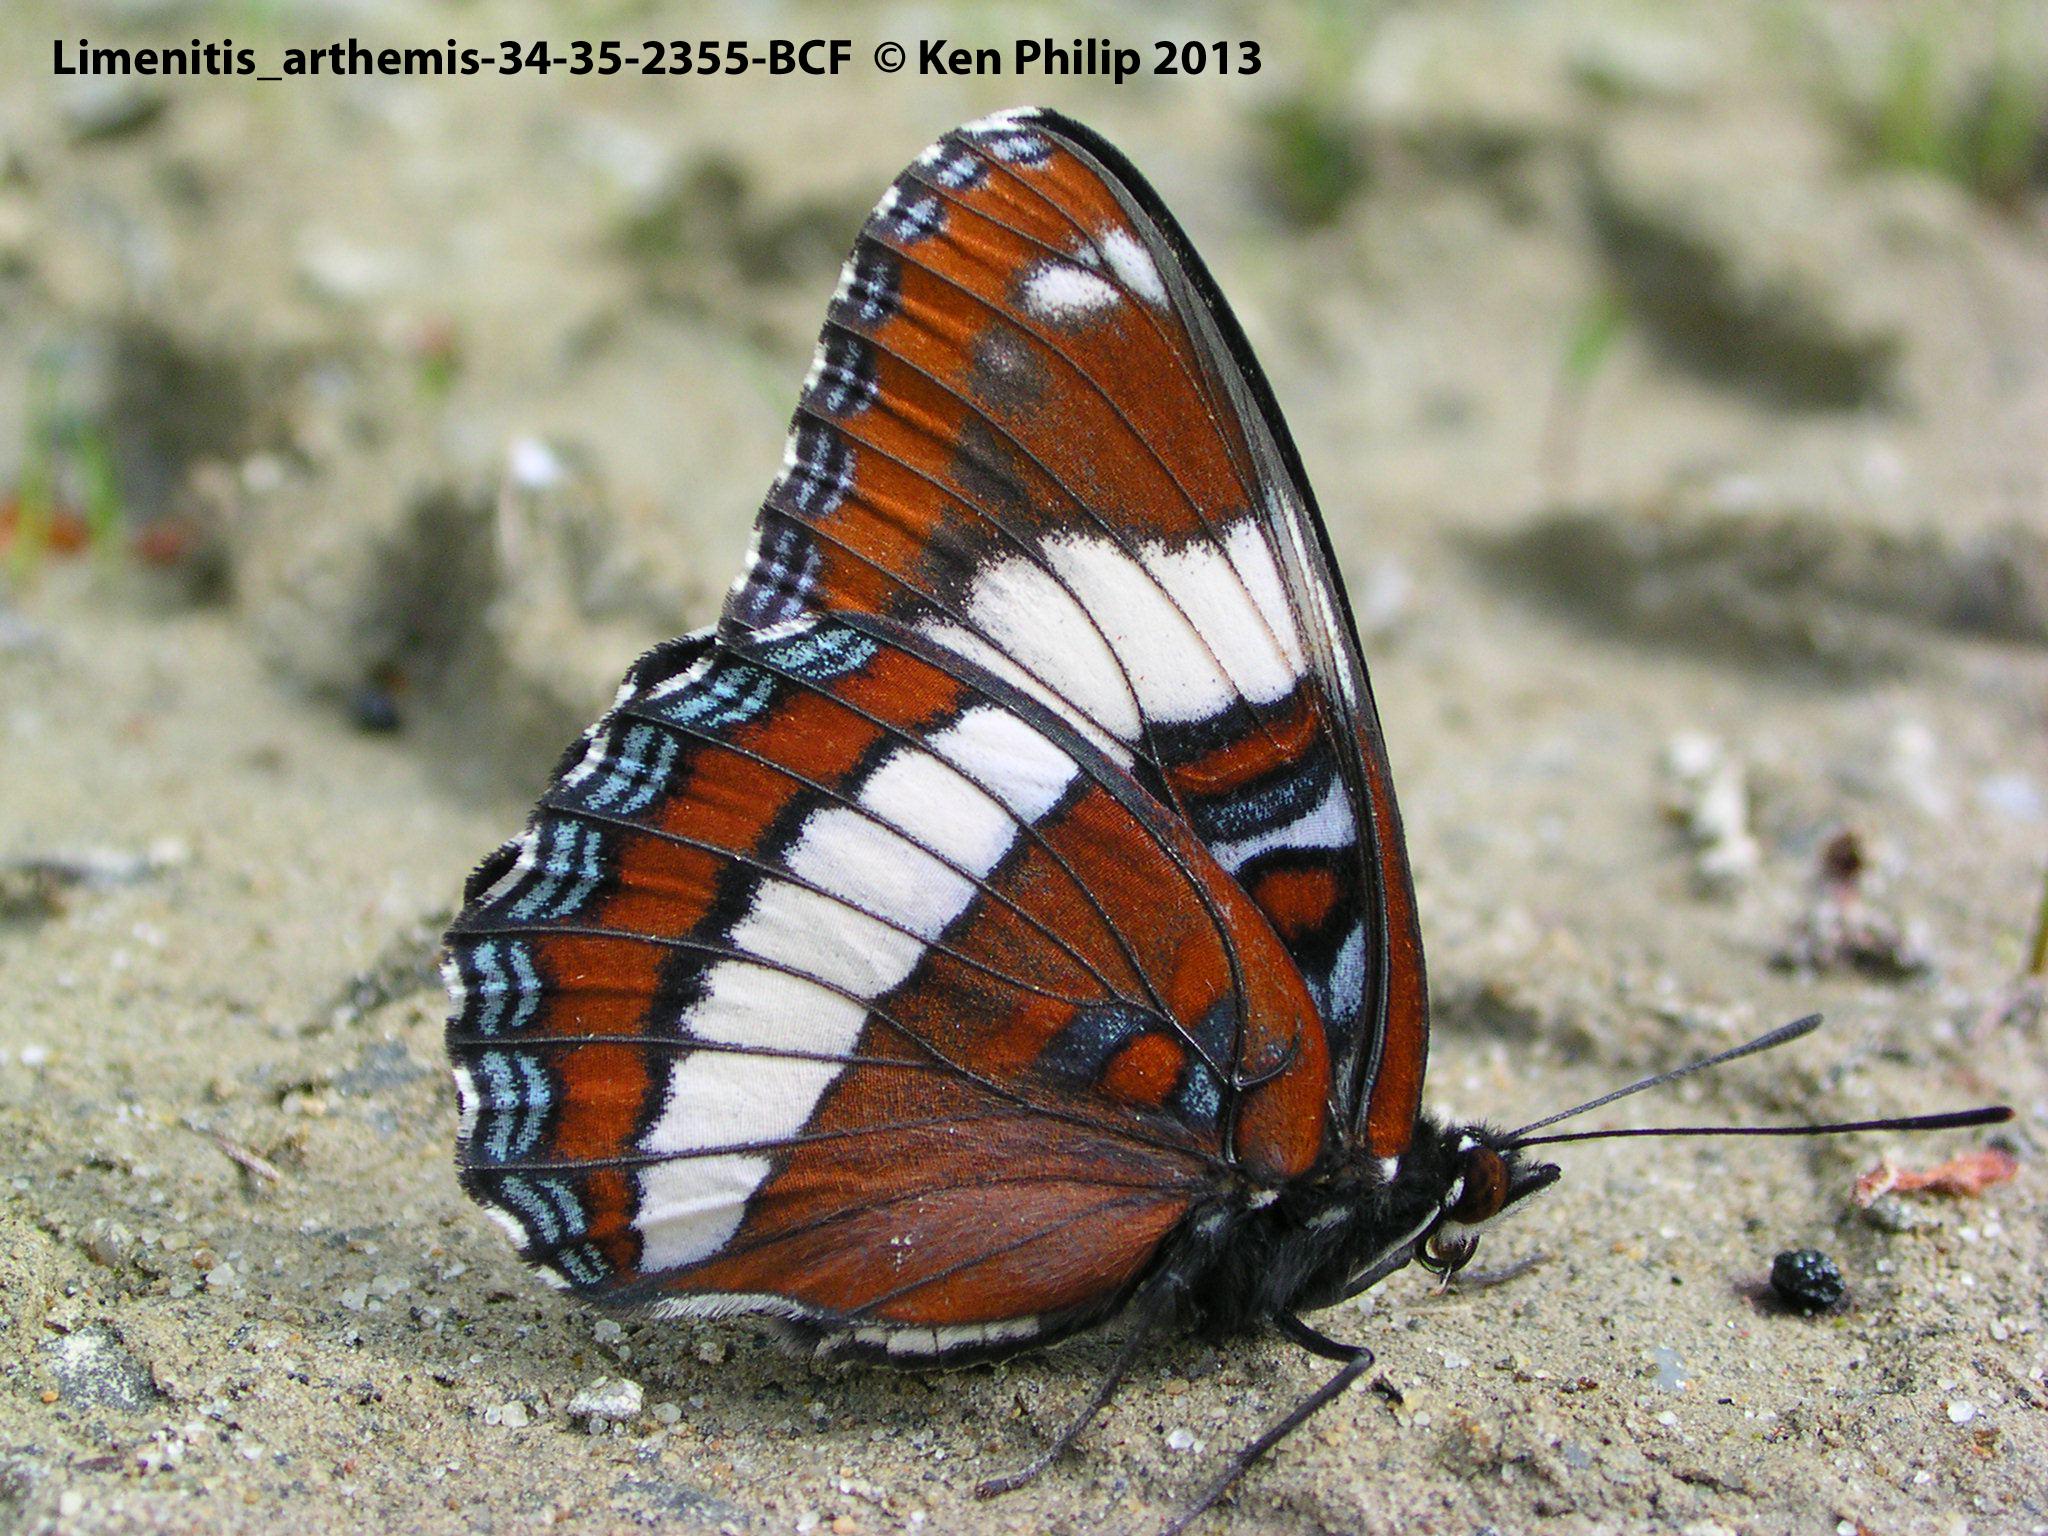 36-Limenitis_arthemis-34-35-2355-BCF